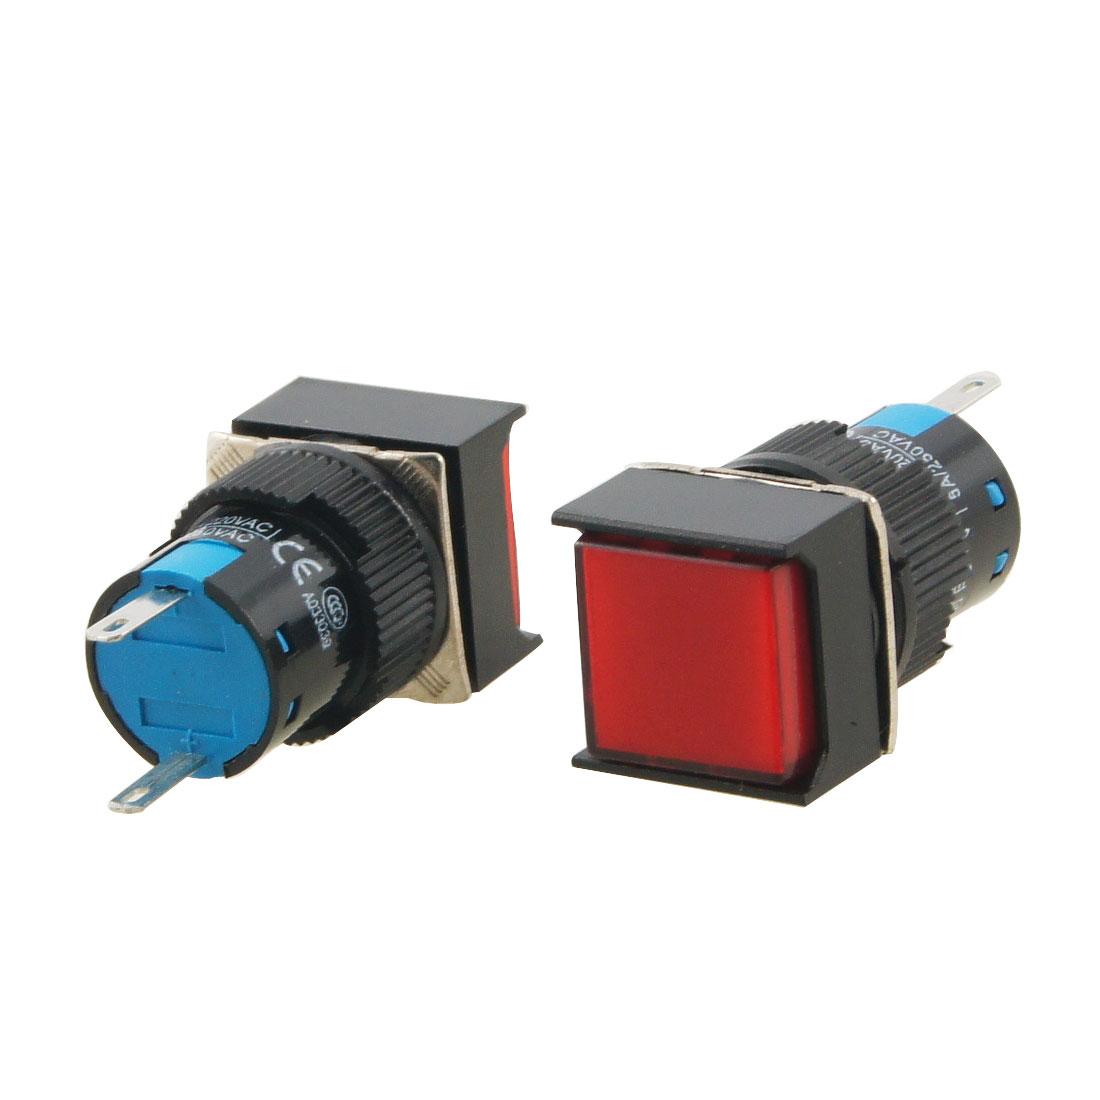 AC 220V Panel Mount Red Square Signal Lamp Indicator Lamp 2 Pcs Gdqun